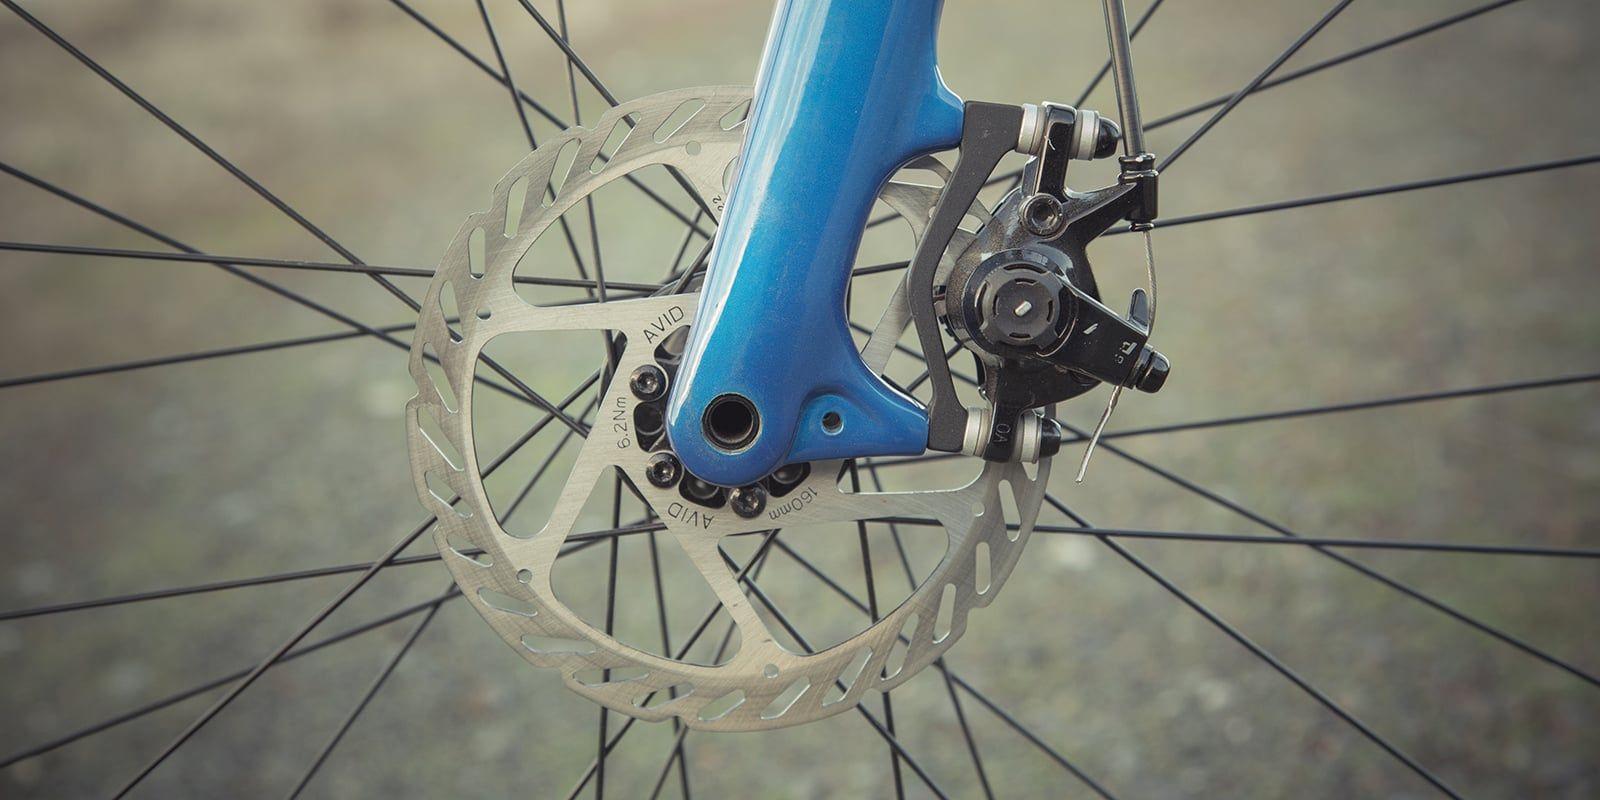 How To Check And Adjust Bike Disc Brakes In 2020 Bike Bike Repair Buy Bicycle